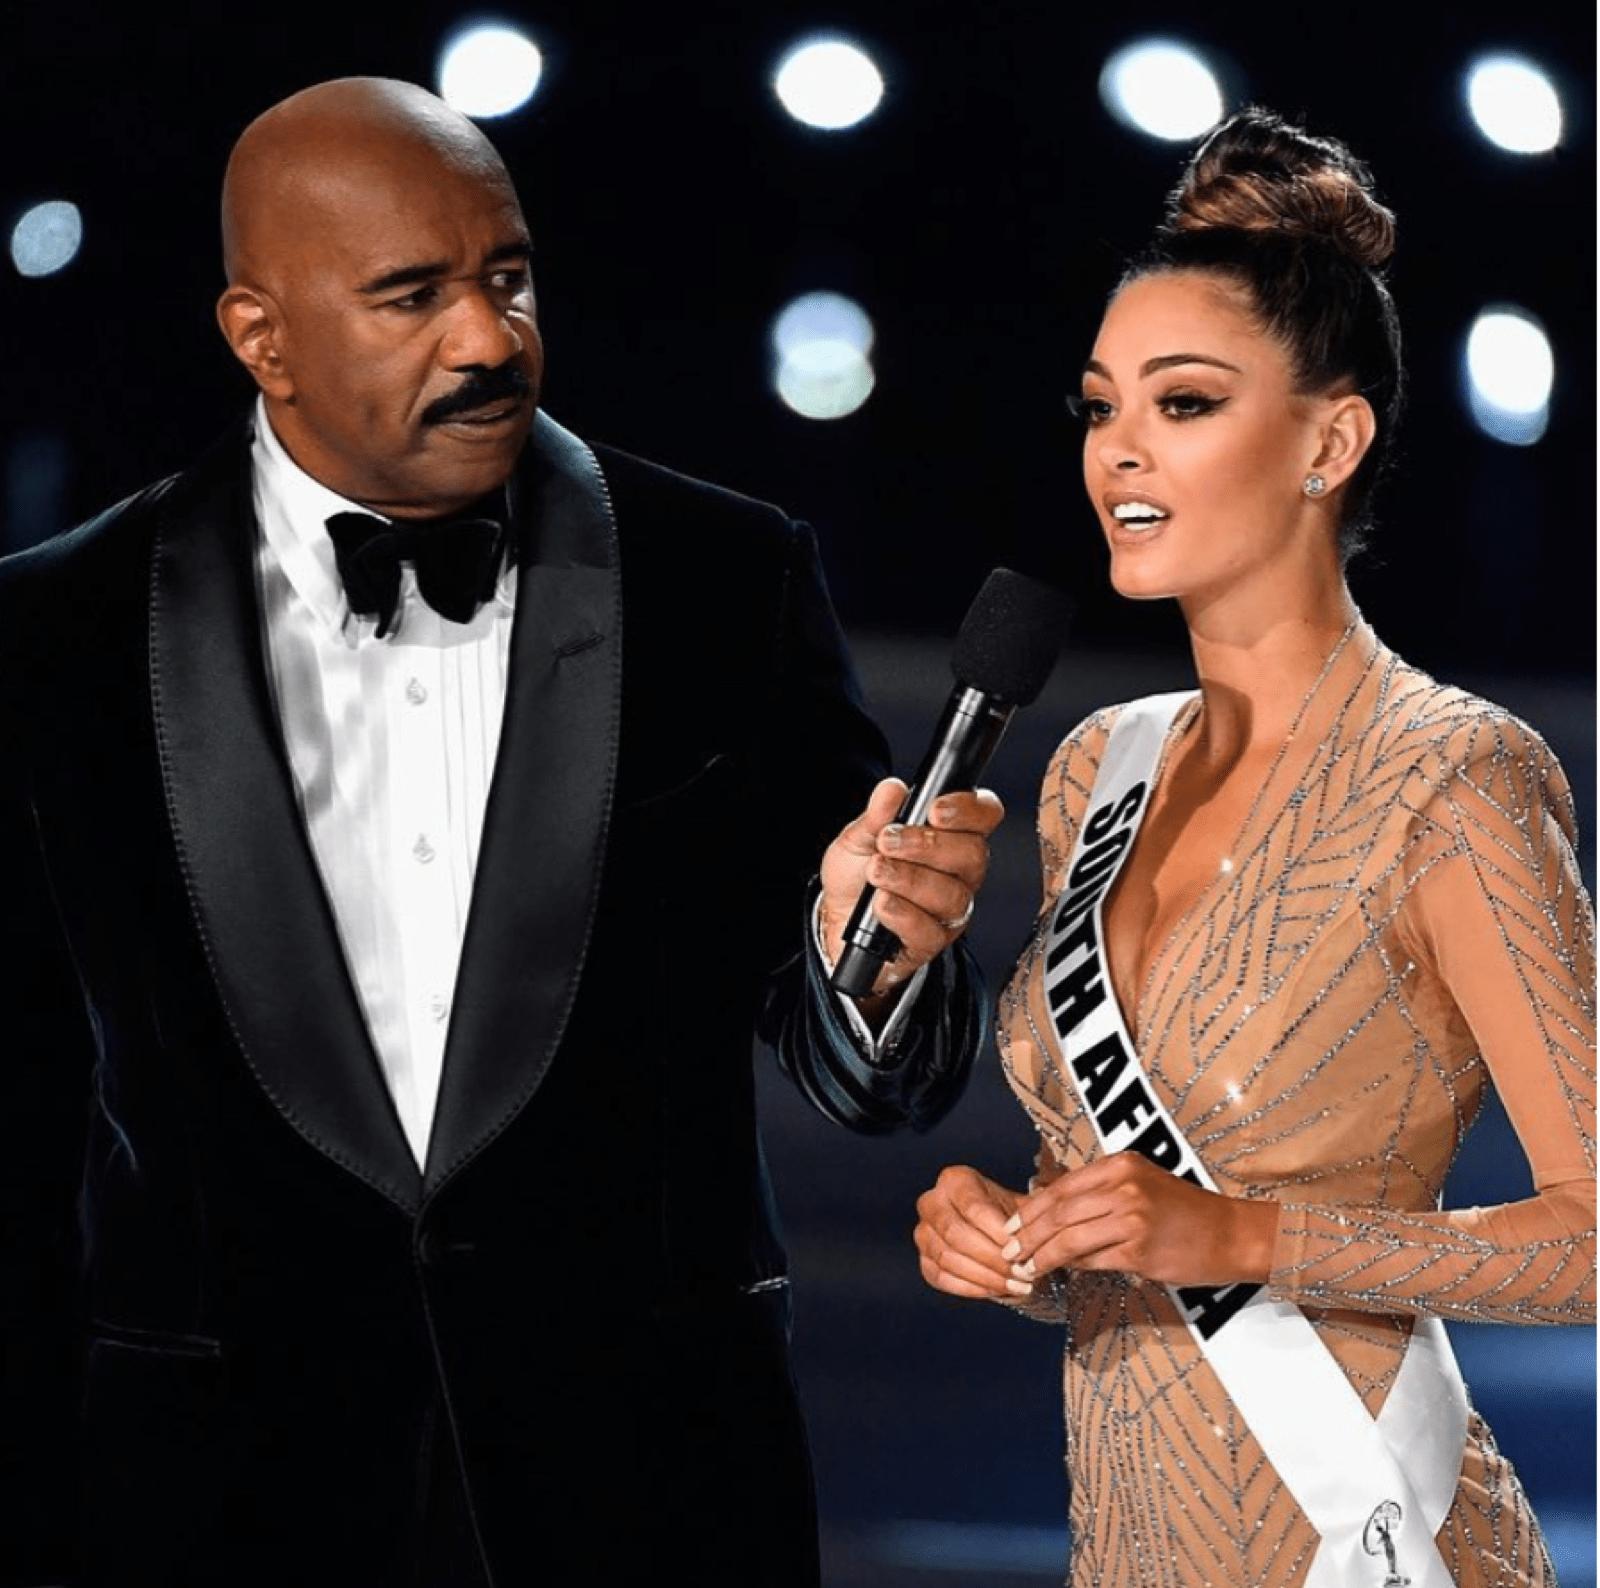 Hispanic Analysis of Miss Universe Pageant 2017